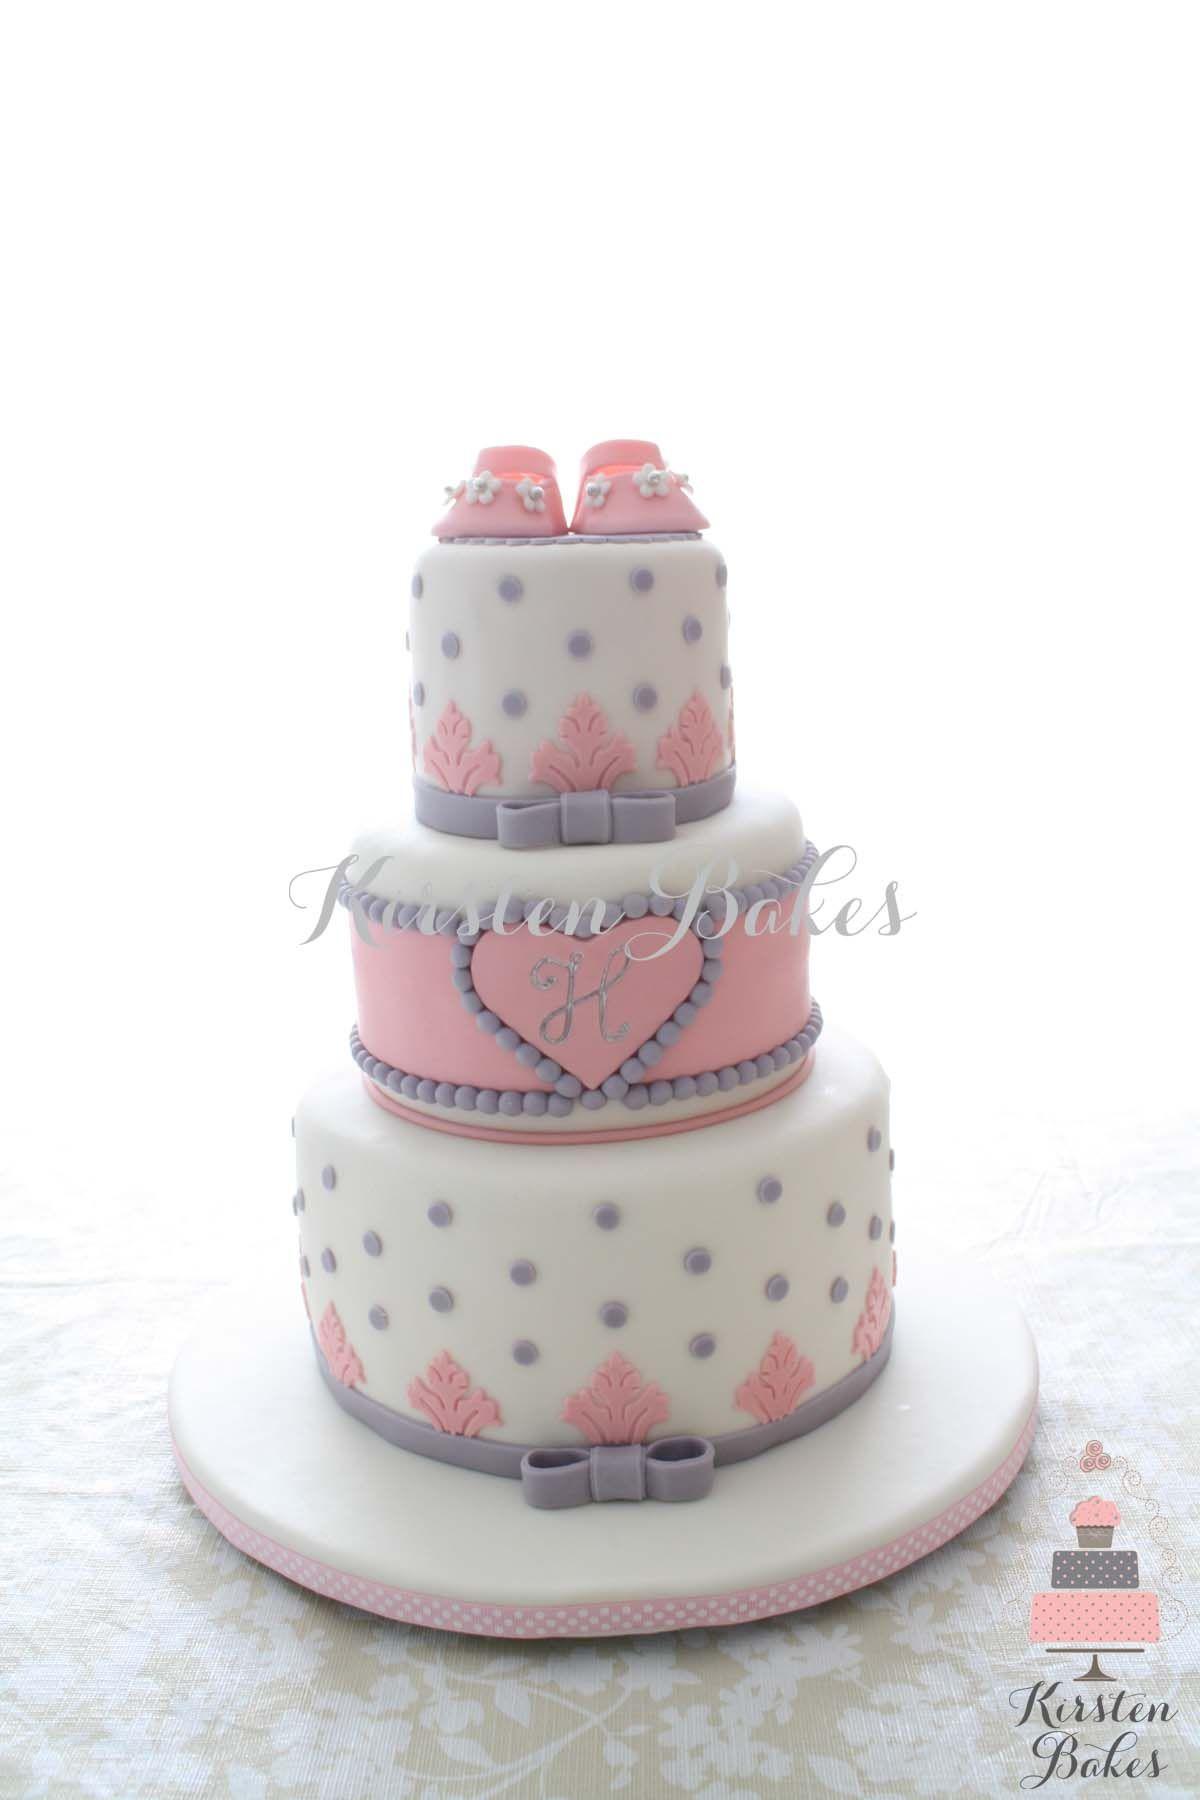 Baby Shower Cake Baby Girl Shoes Monogram Pink Grey White